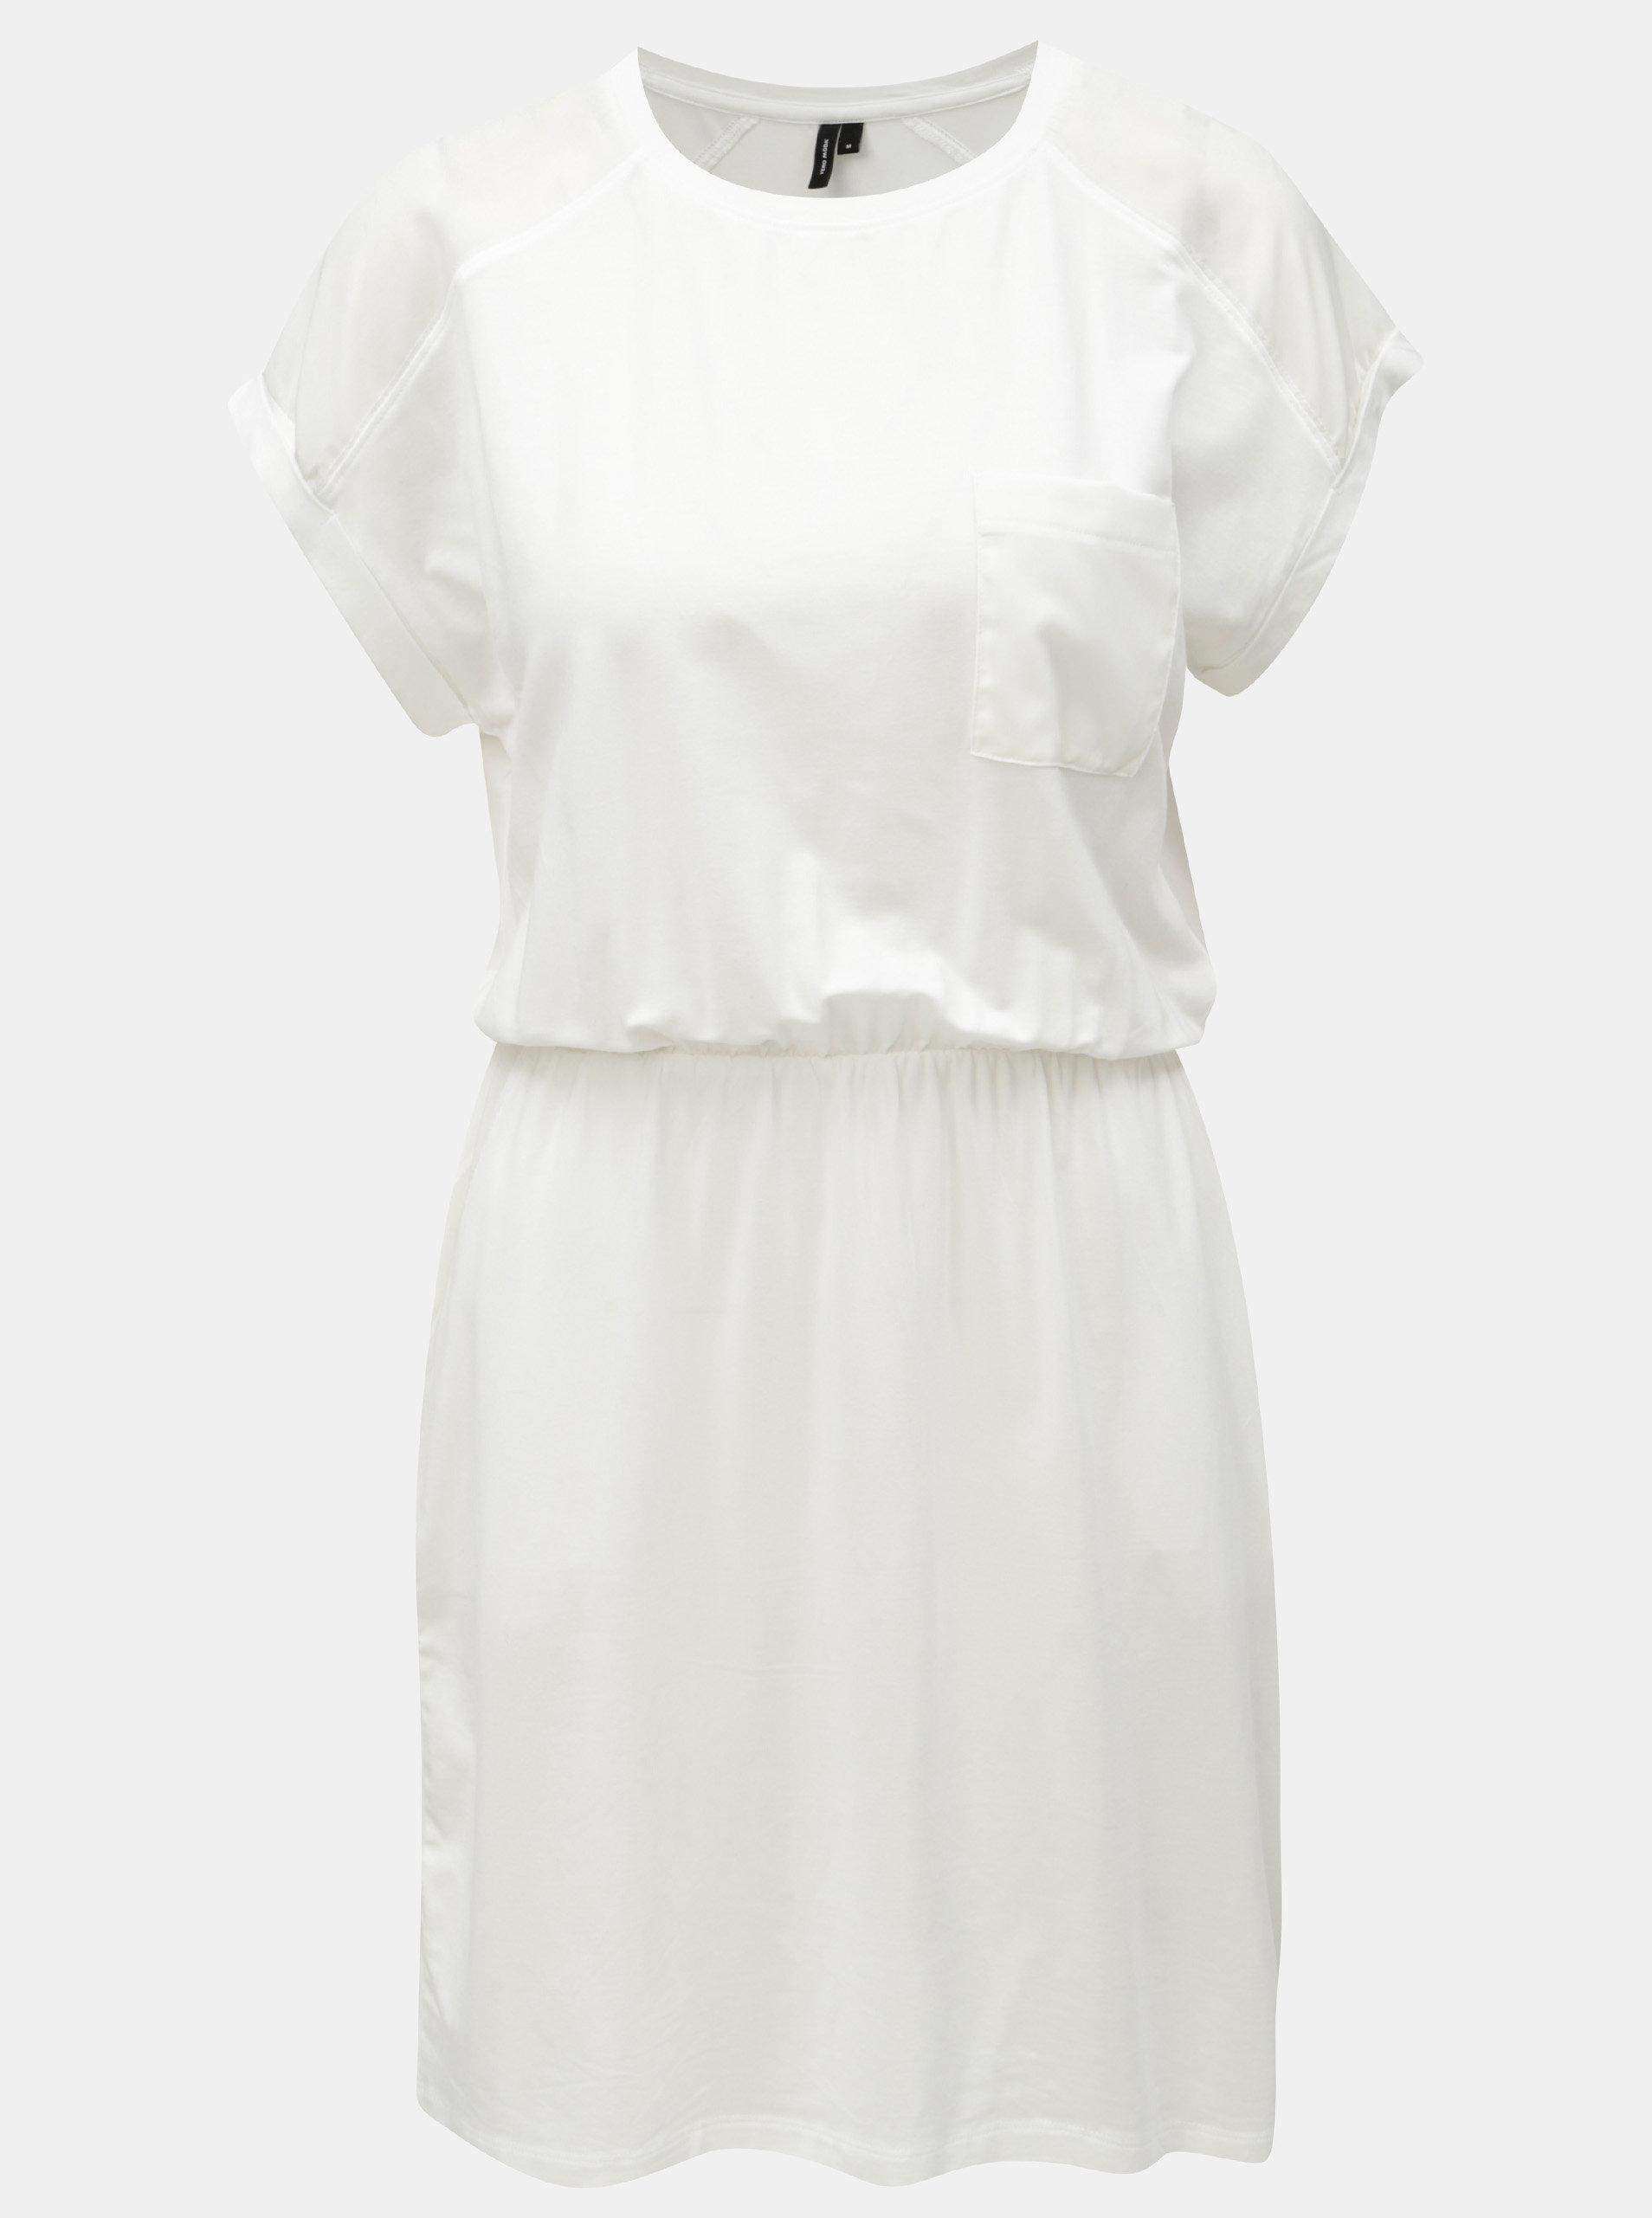 8f3608b4864f Biele šaty s vreckami VERO MODA Ava ...